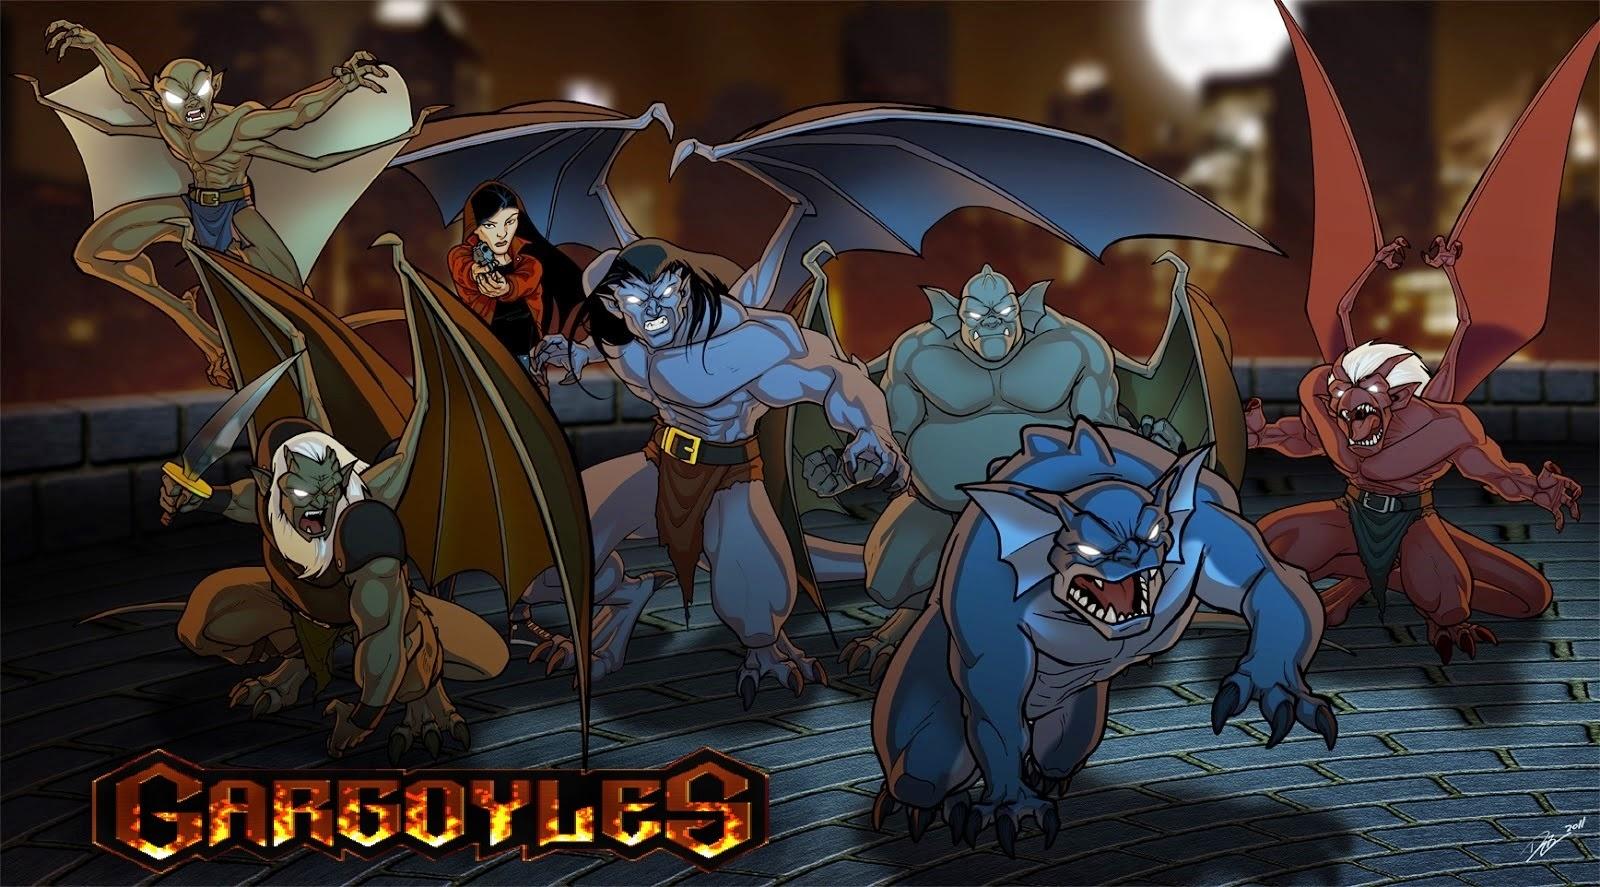 Il mondo di supergoku gargoyles risveglio degli eroi